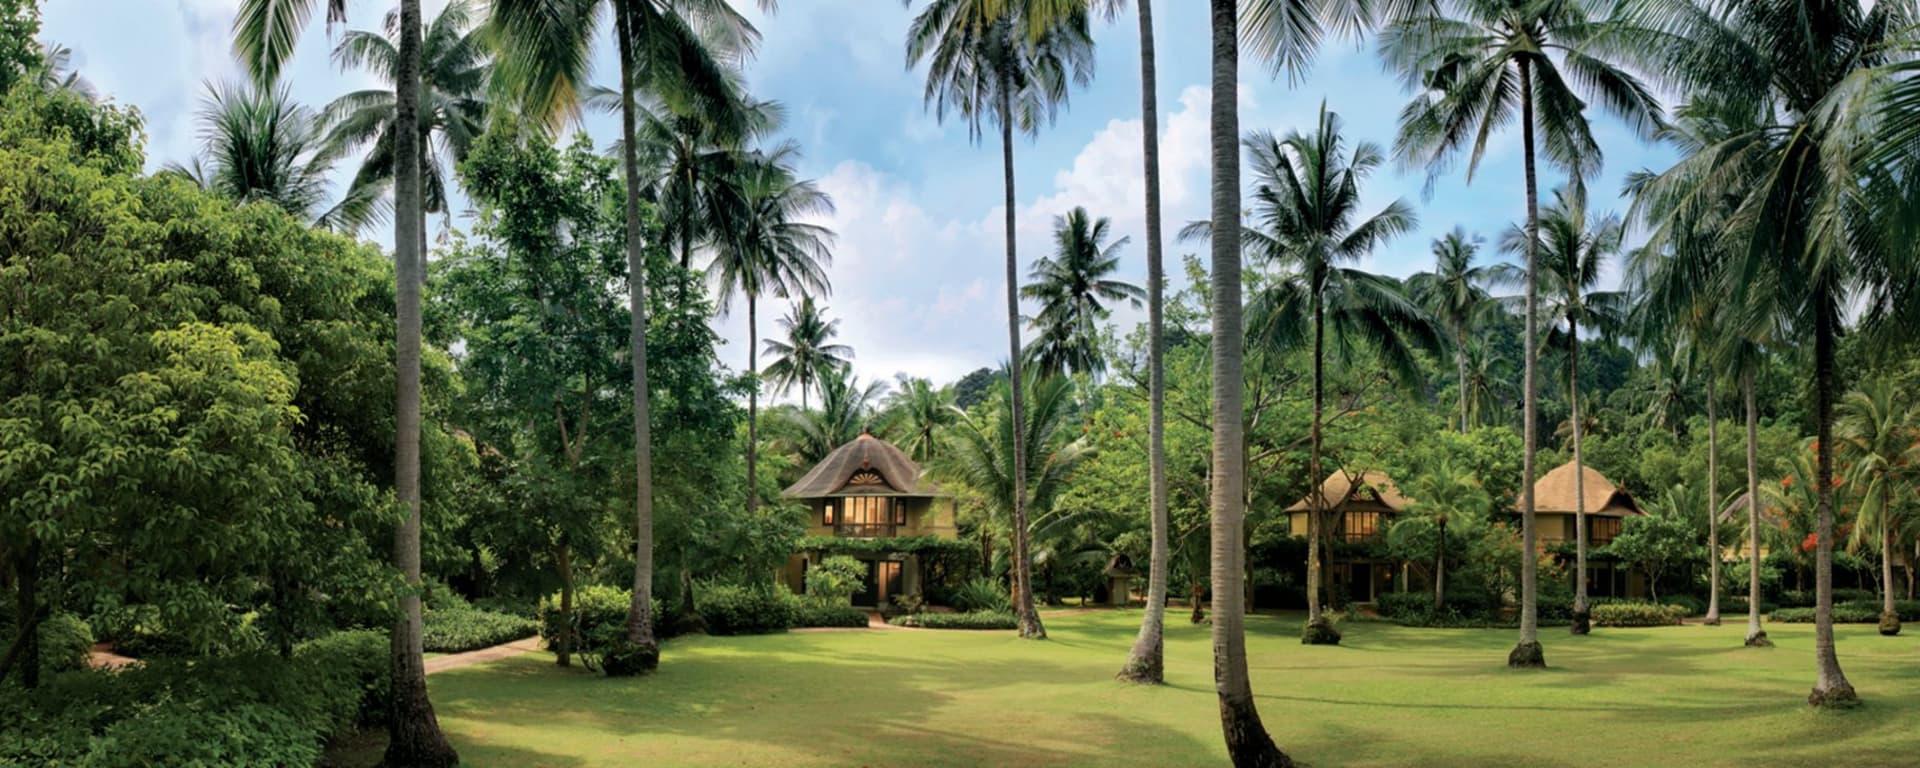 Rayavadee in Krabi: Rayavadee's Natural Setting